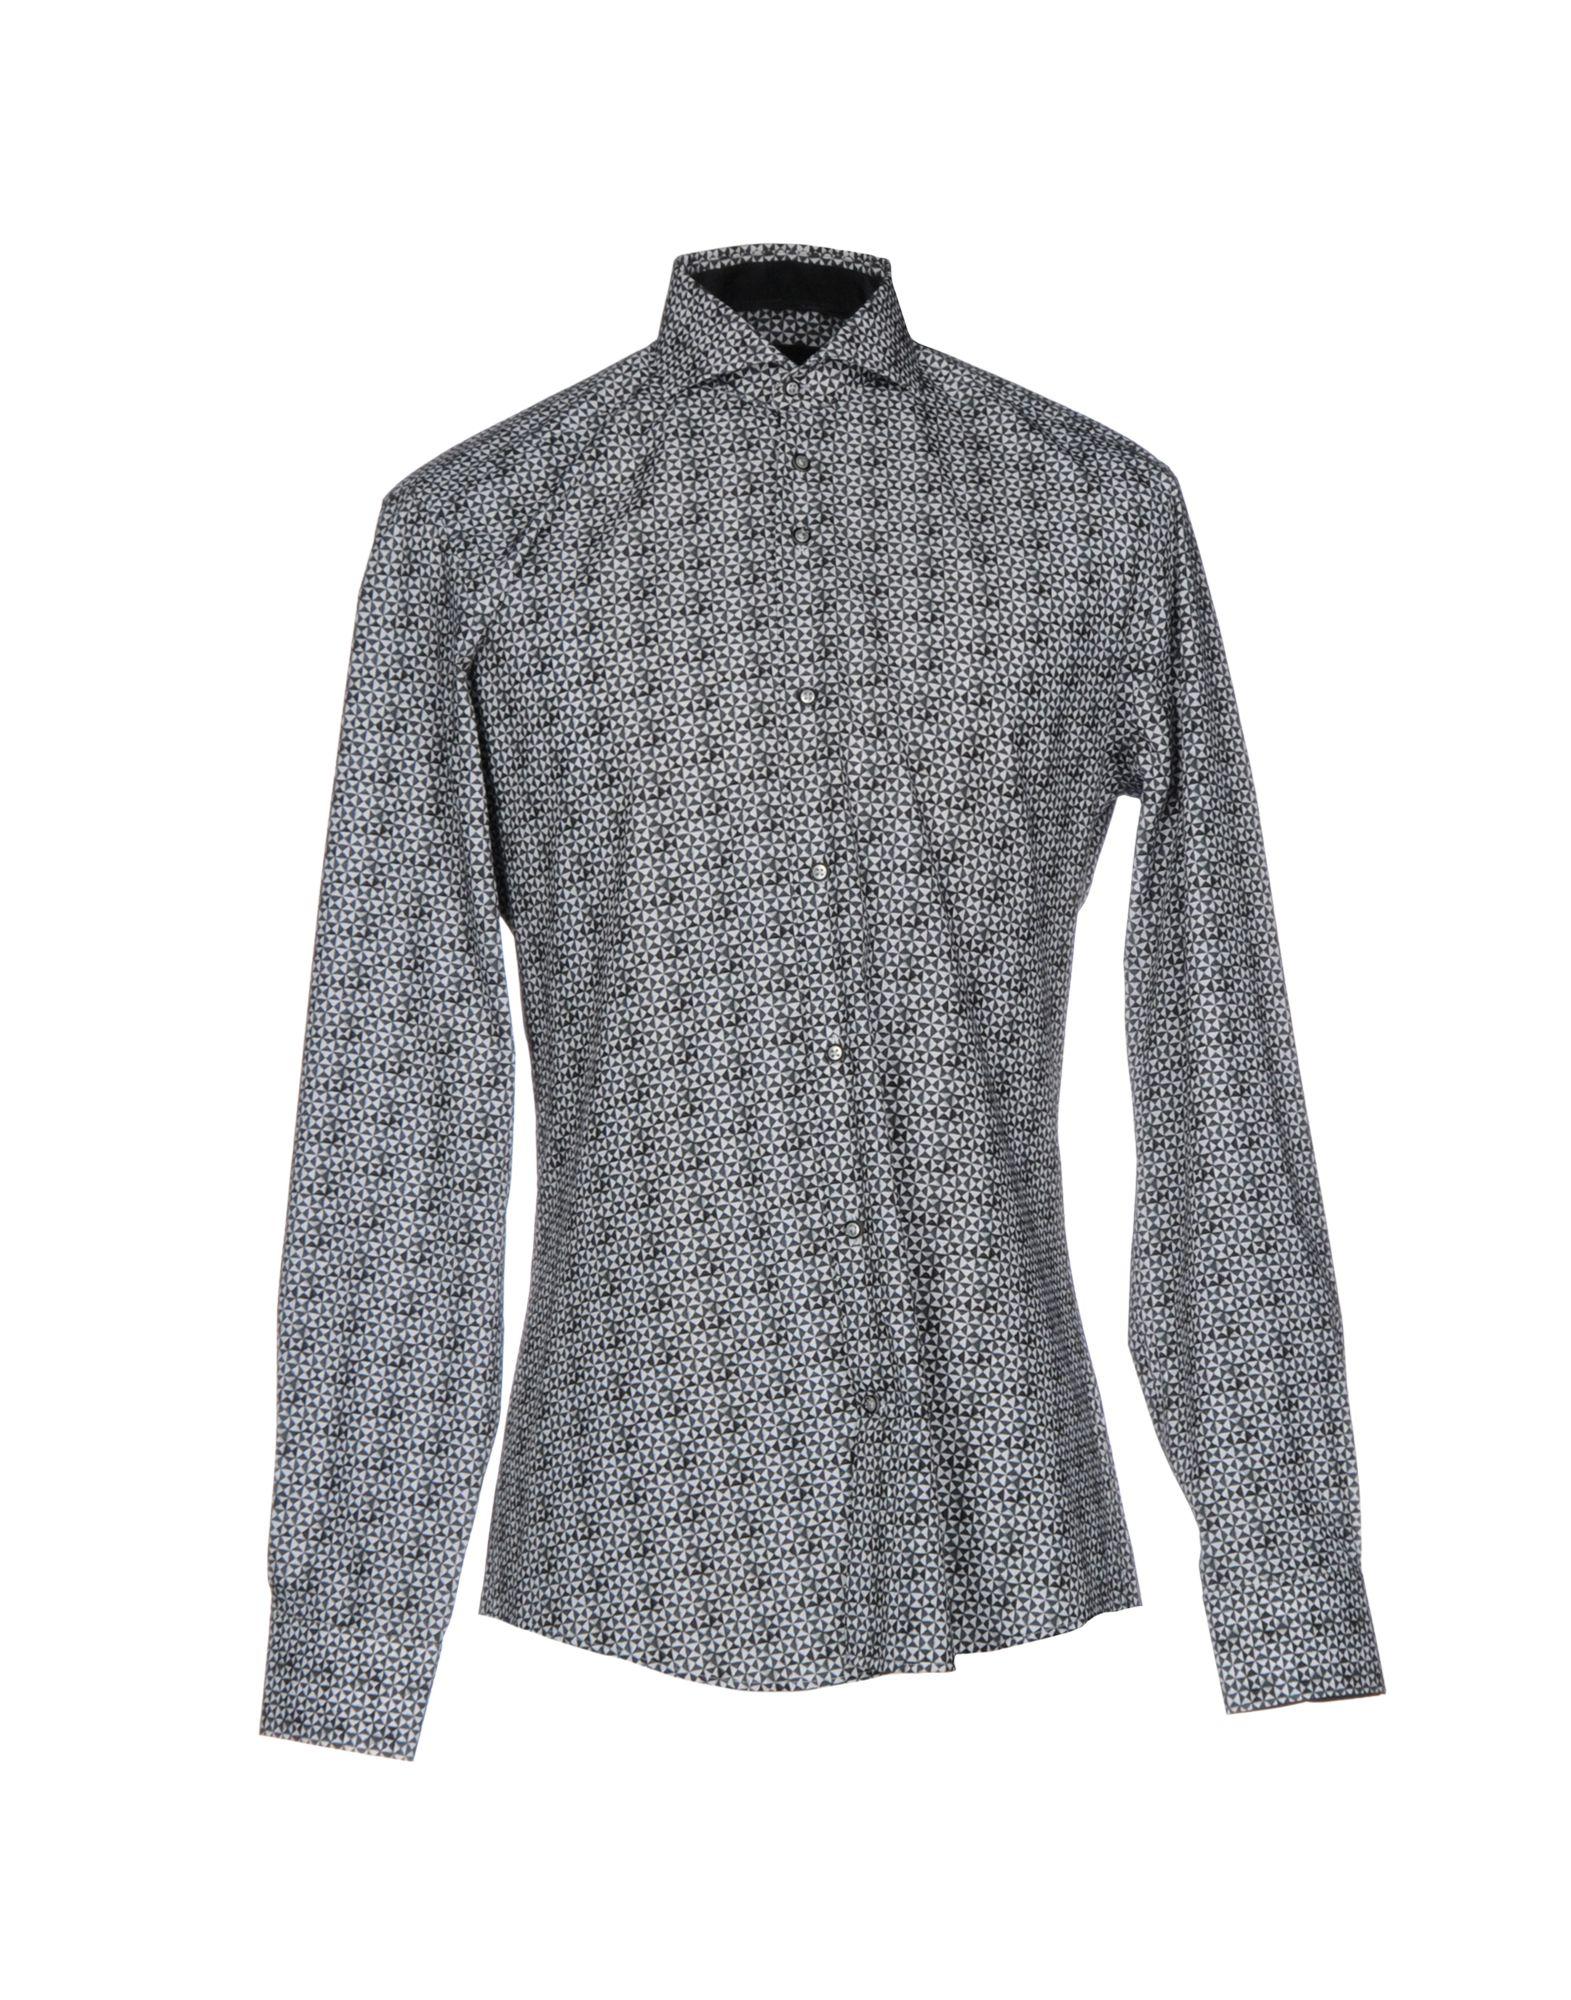 R2 WESTBROOK Pубашка 45 r pубашка